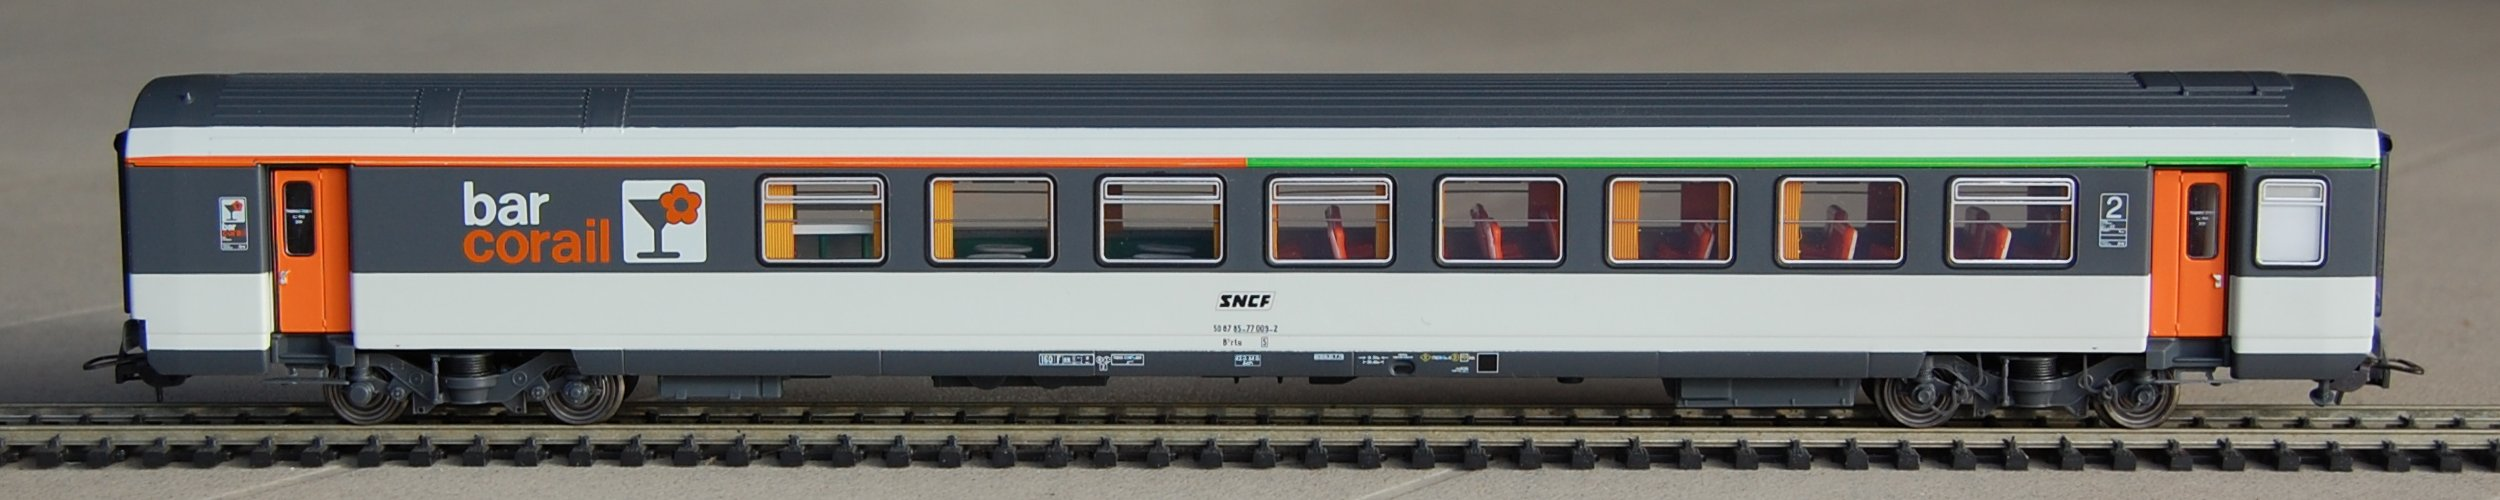 lsmodels LS Models製 コライユ客車 (HOスケール)